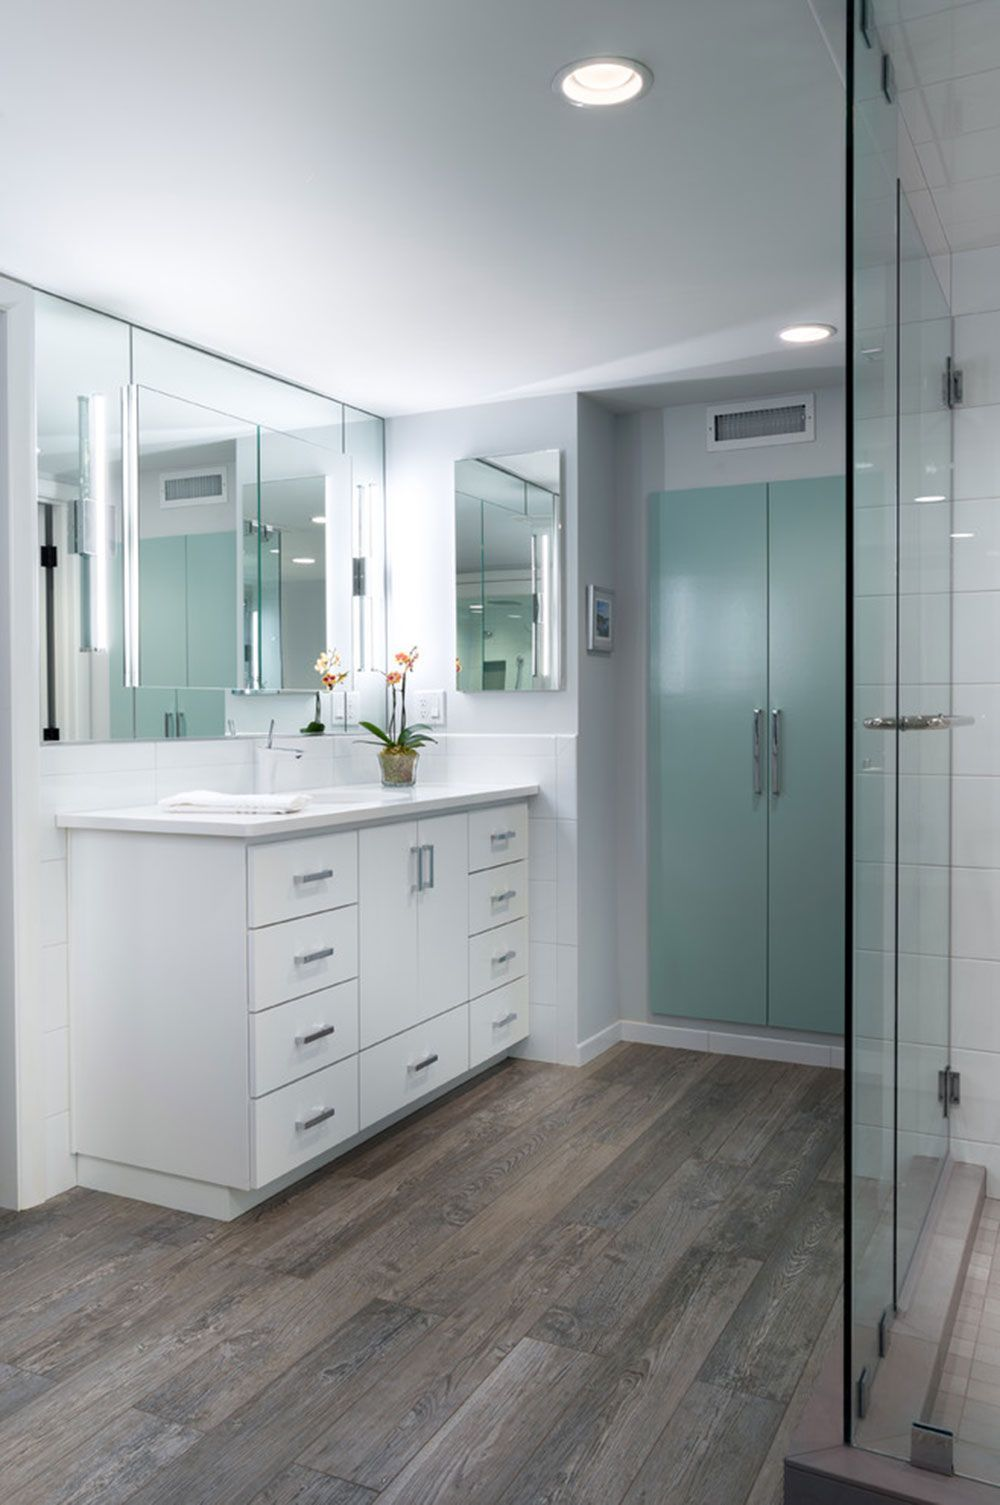 Tips For Choosing Tile That Looks Like Wood Easy Bathroom Decorating Wood Tile Bathroom Bathroom Wall Decor